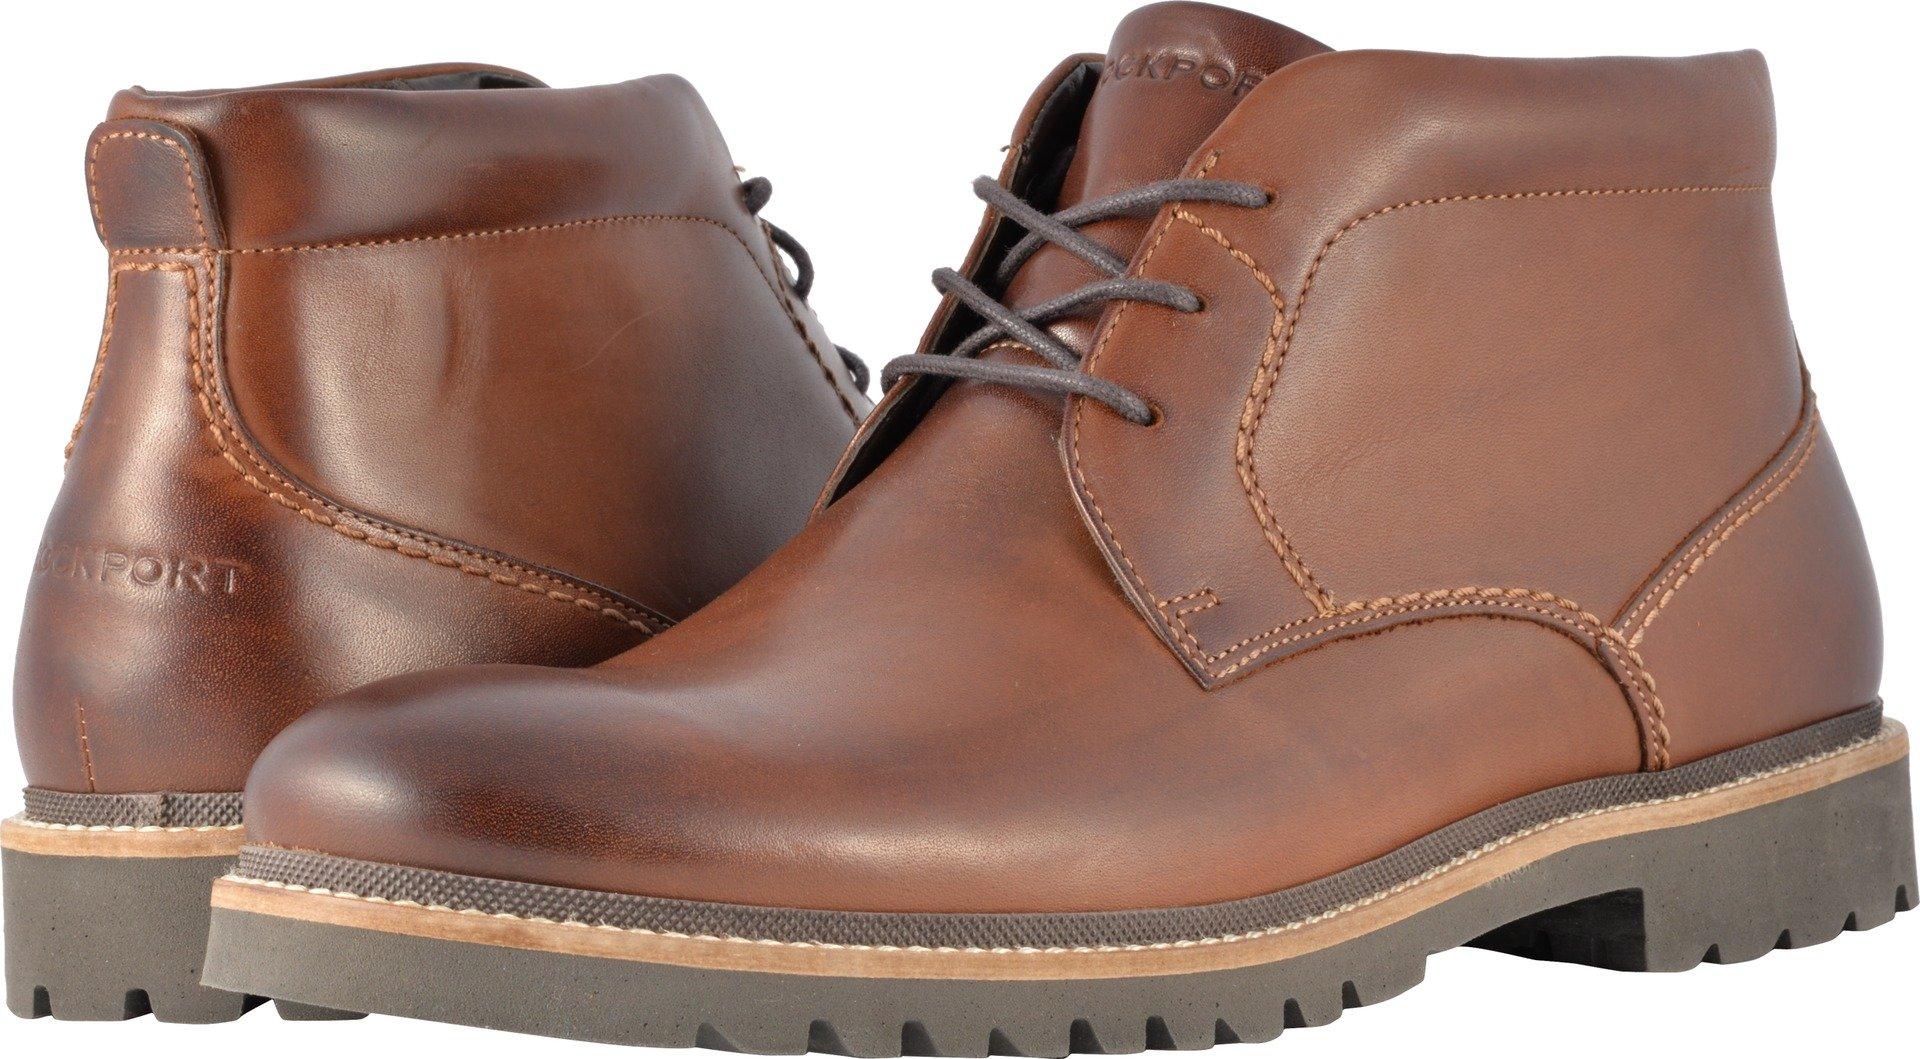 Rockport Men's Marshall Chukka Chukka Boot, Dark Brown Leather, 9.5 W US